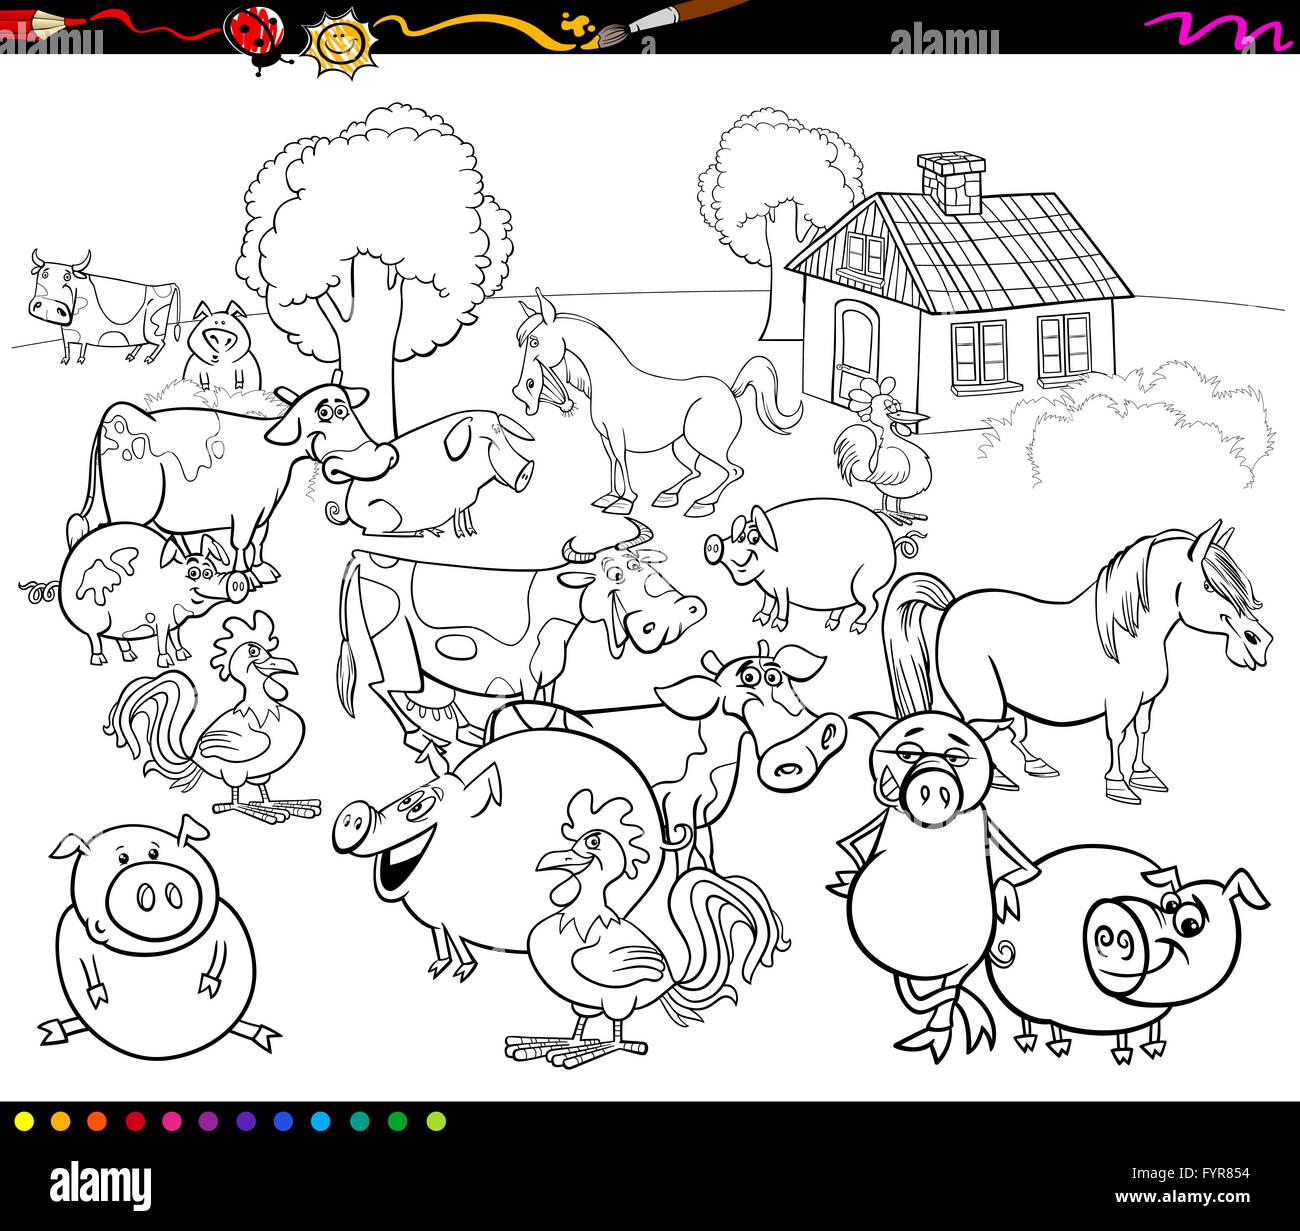 Group Cartoon Farm Animals Coloring Stockfotos & Group Cartoon Farm ...